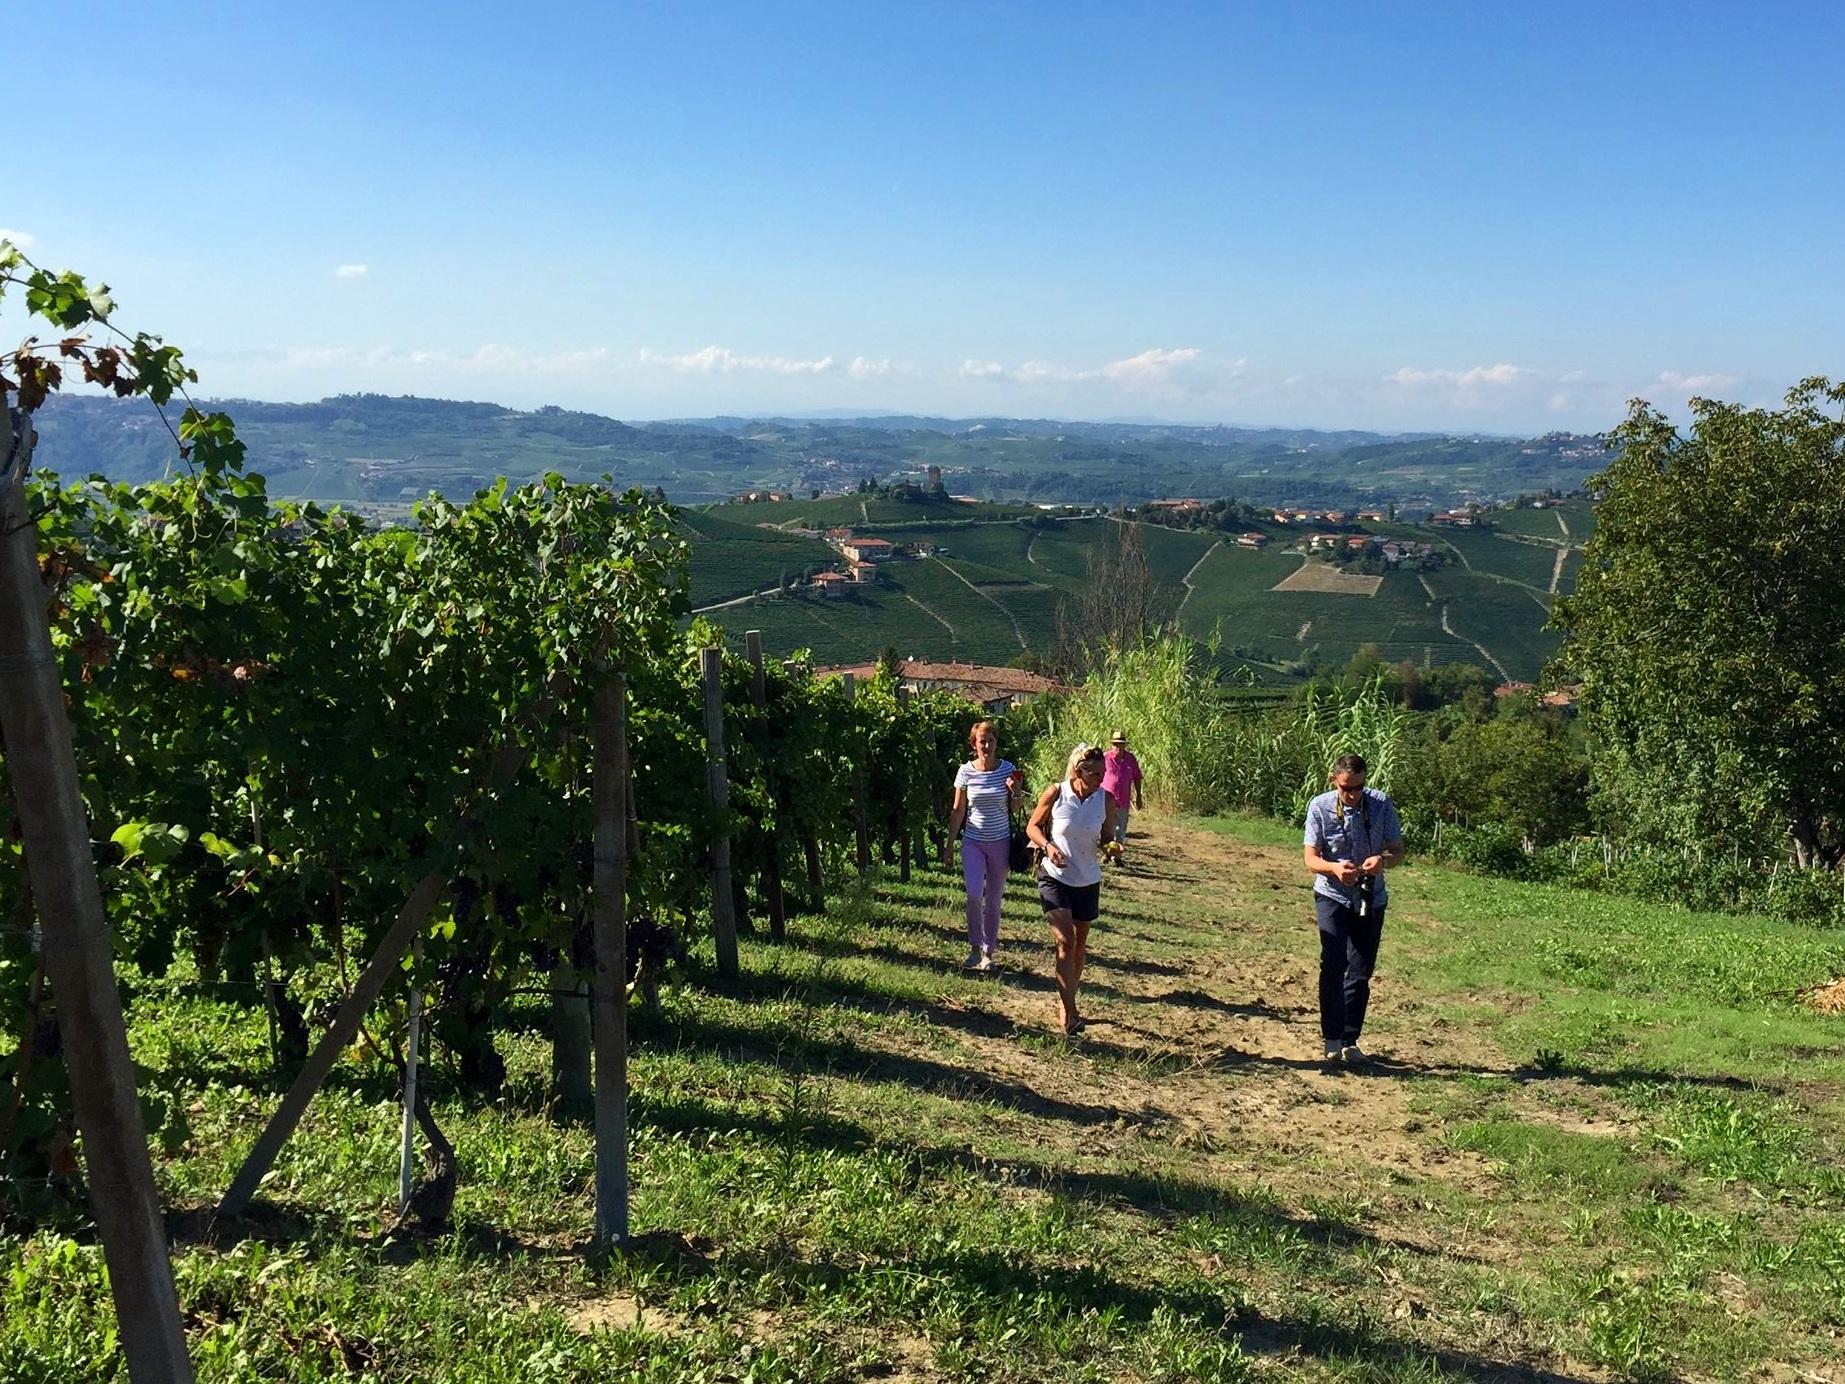 Vineyard slopes in the Barbaresco Appellation - Neive